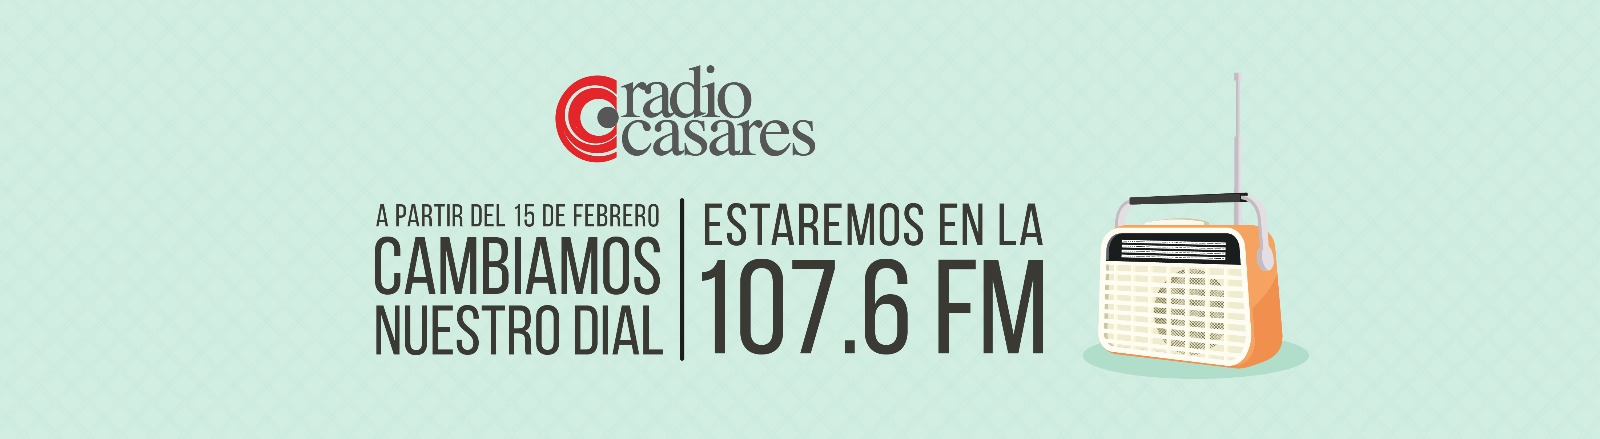 Radio Casares